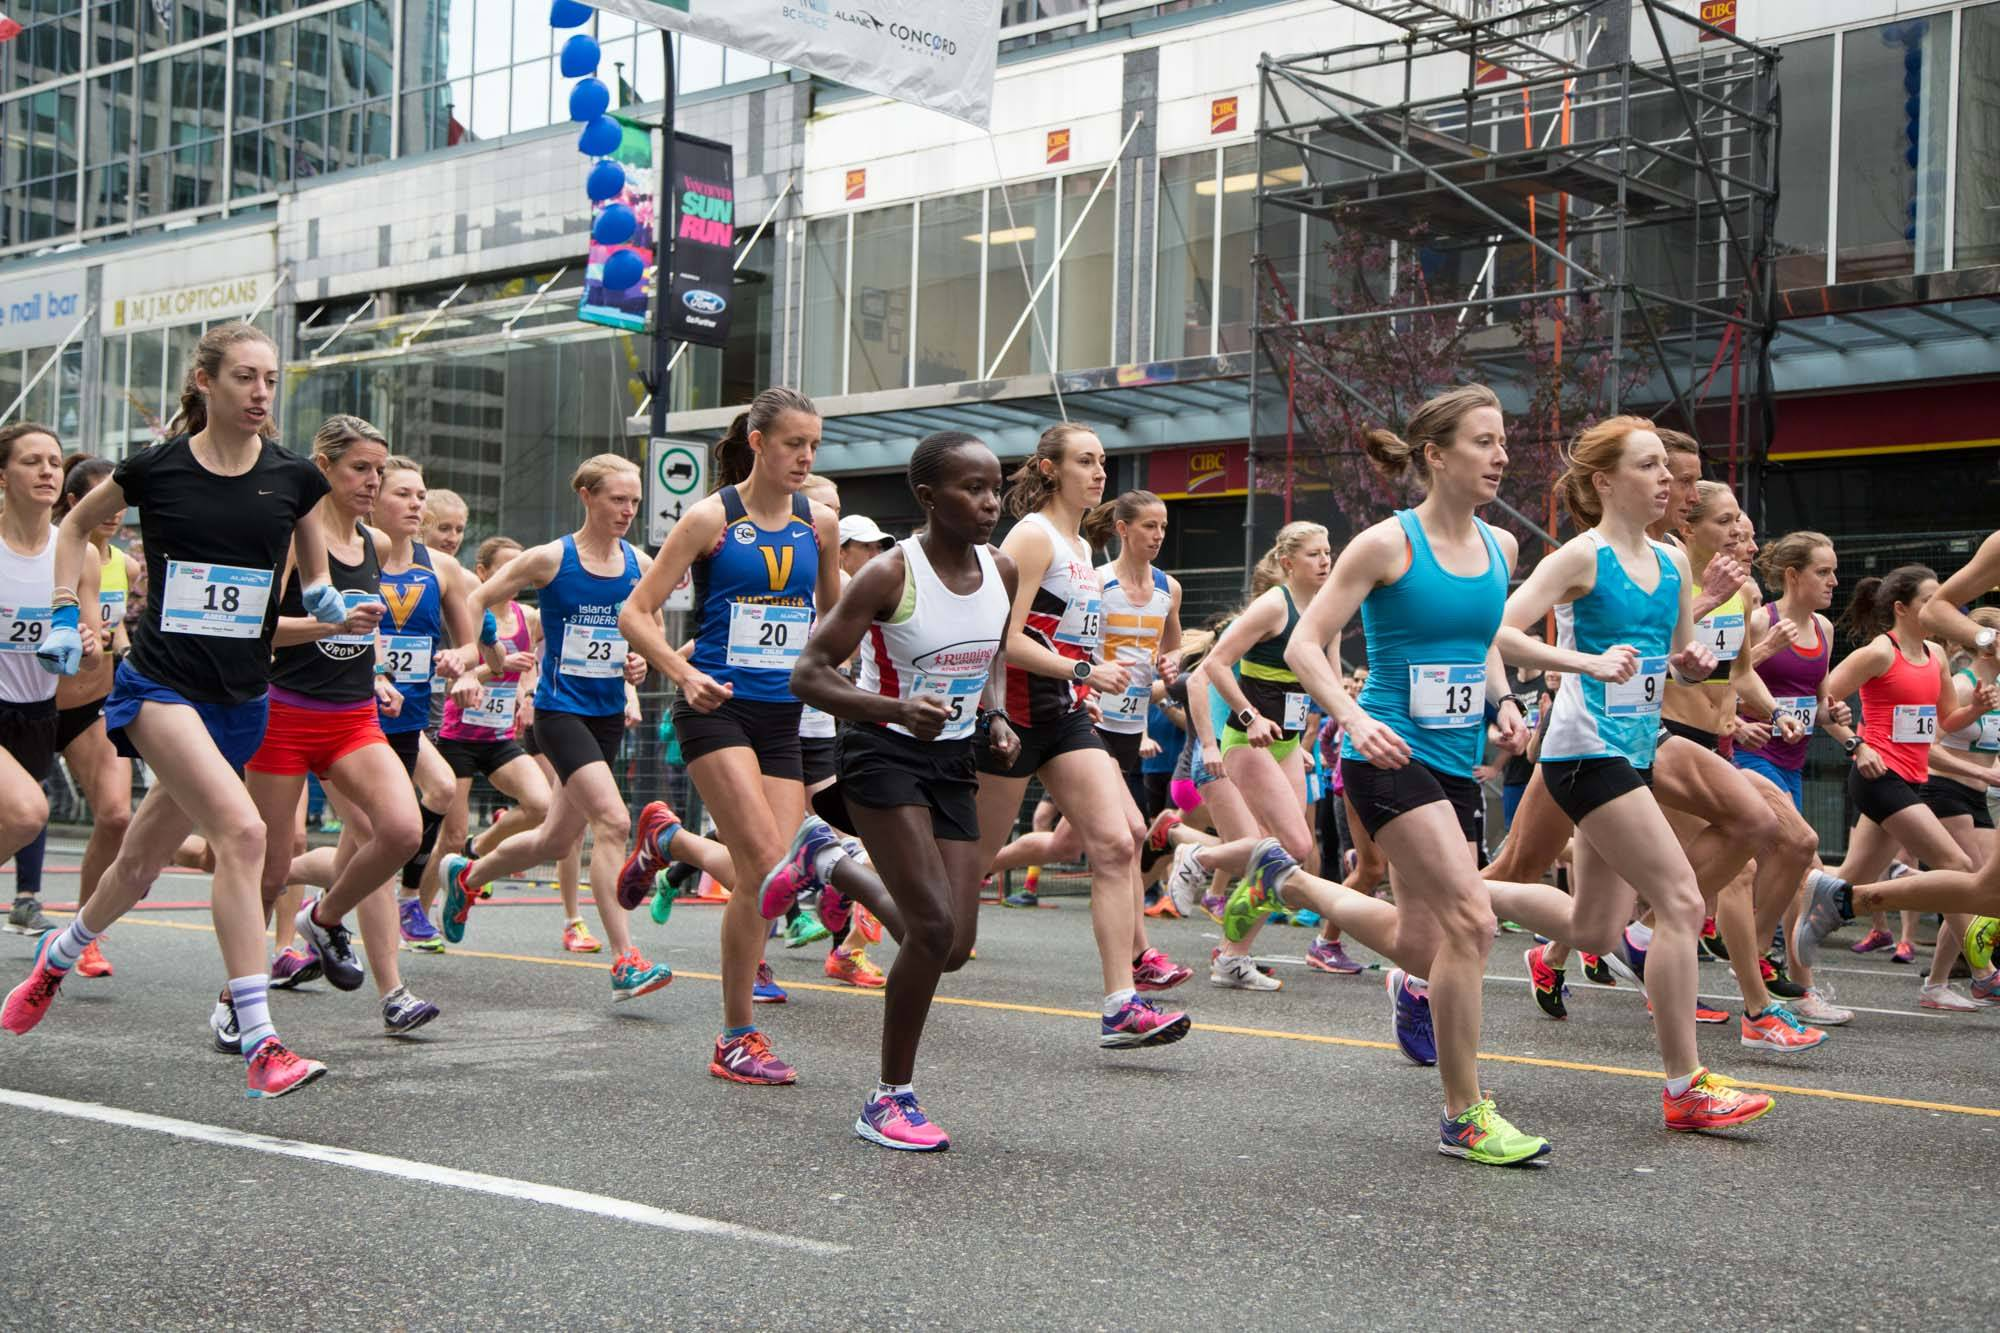 Vancouver Sun Run 2017 - The Snipe News